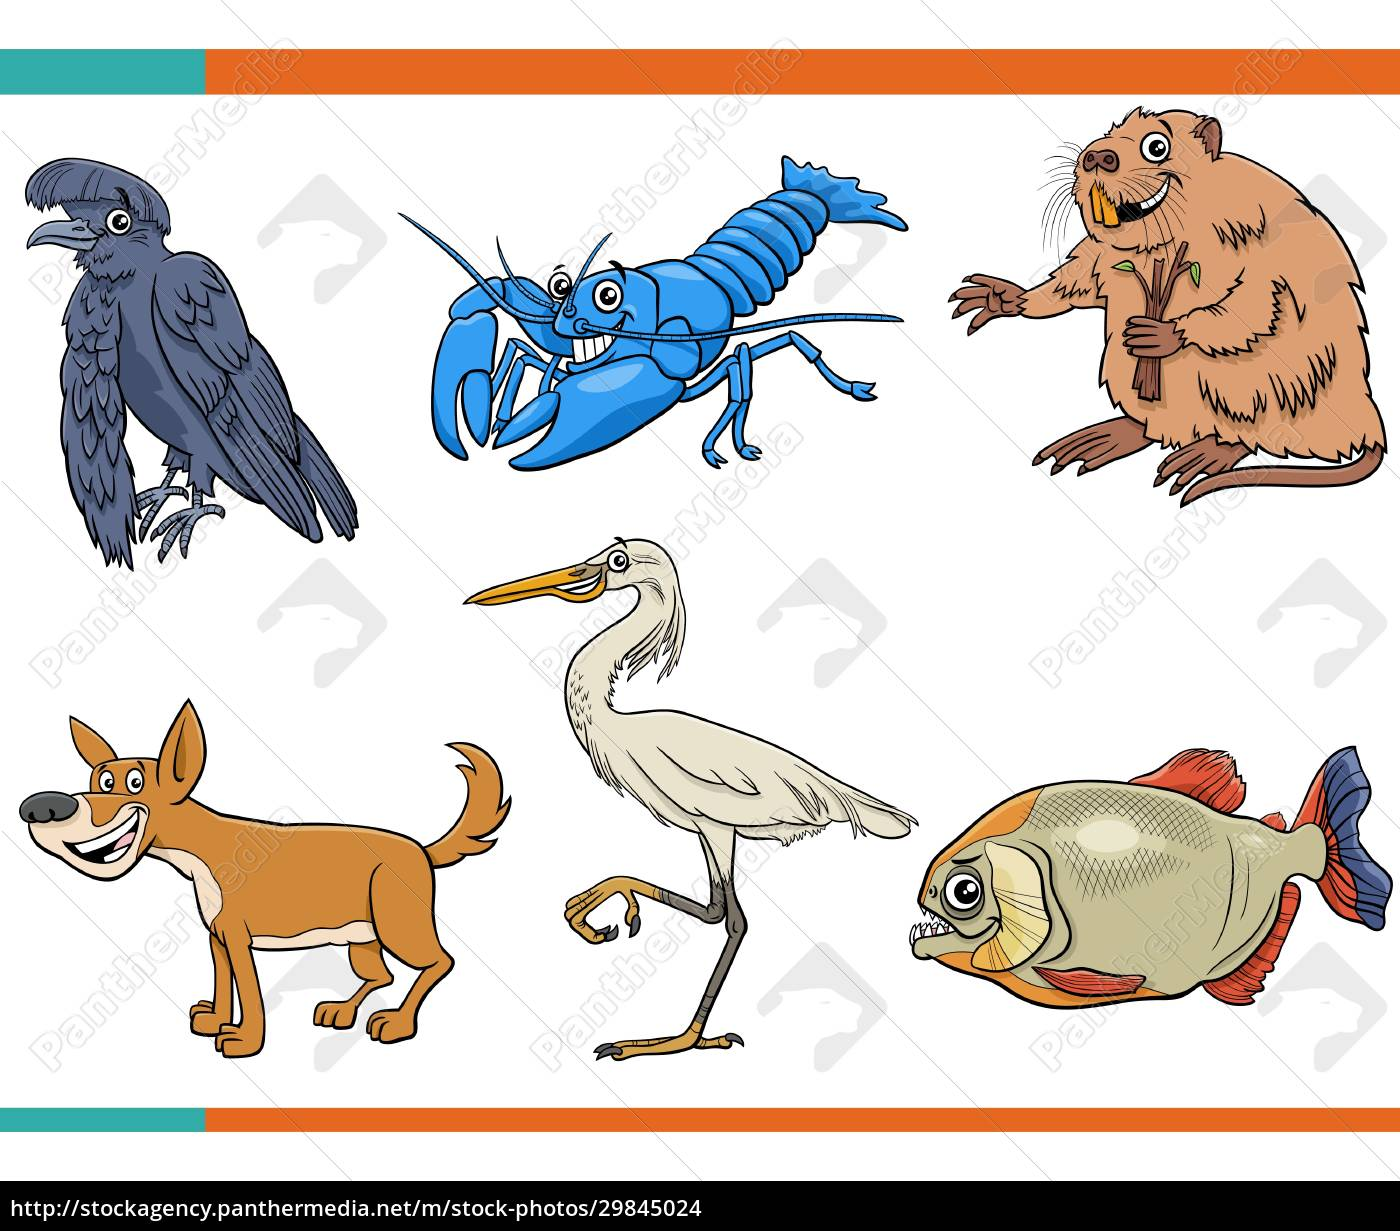 cartoon, funny, wild, animals, comic, characters - 29845024